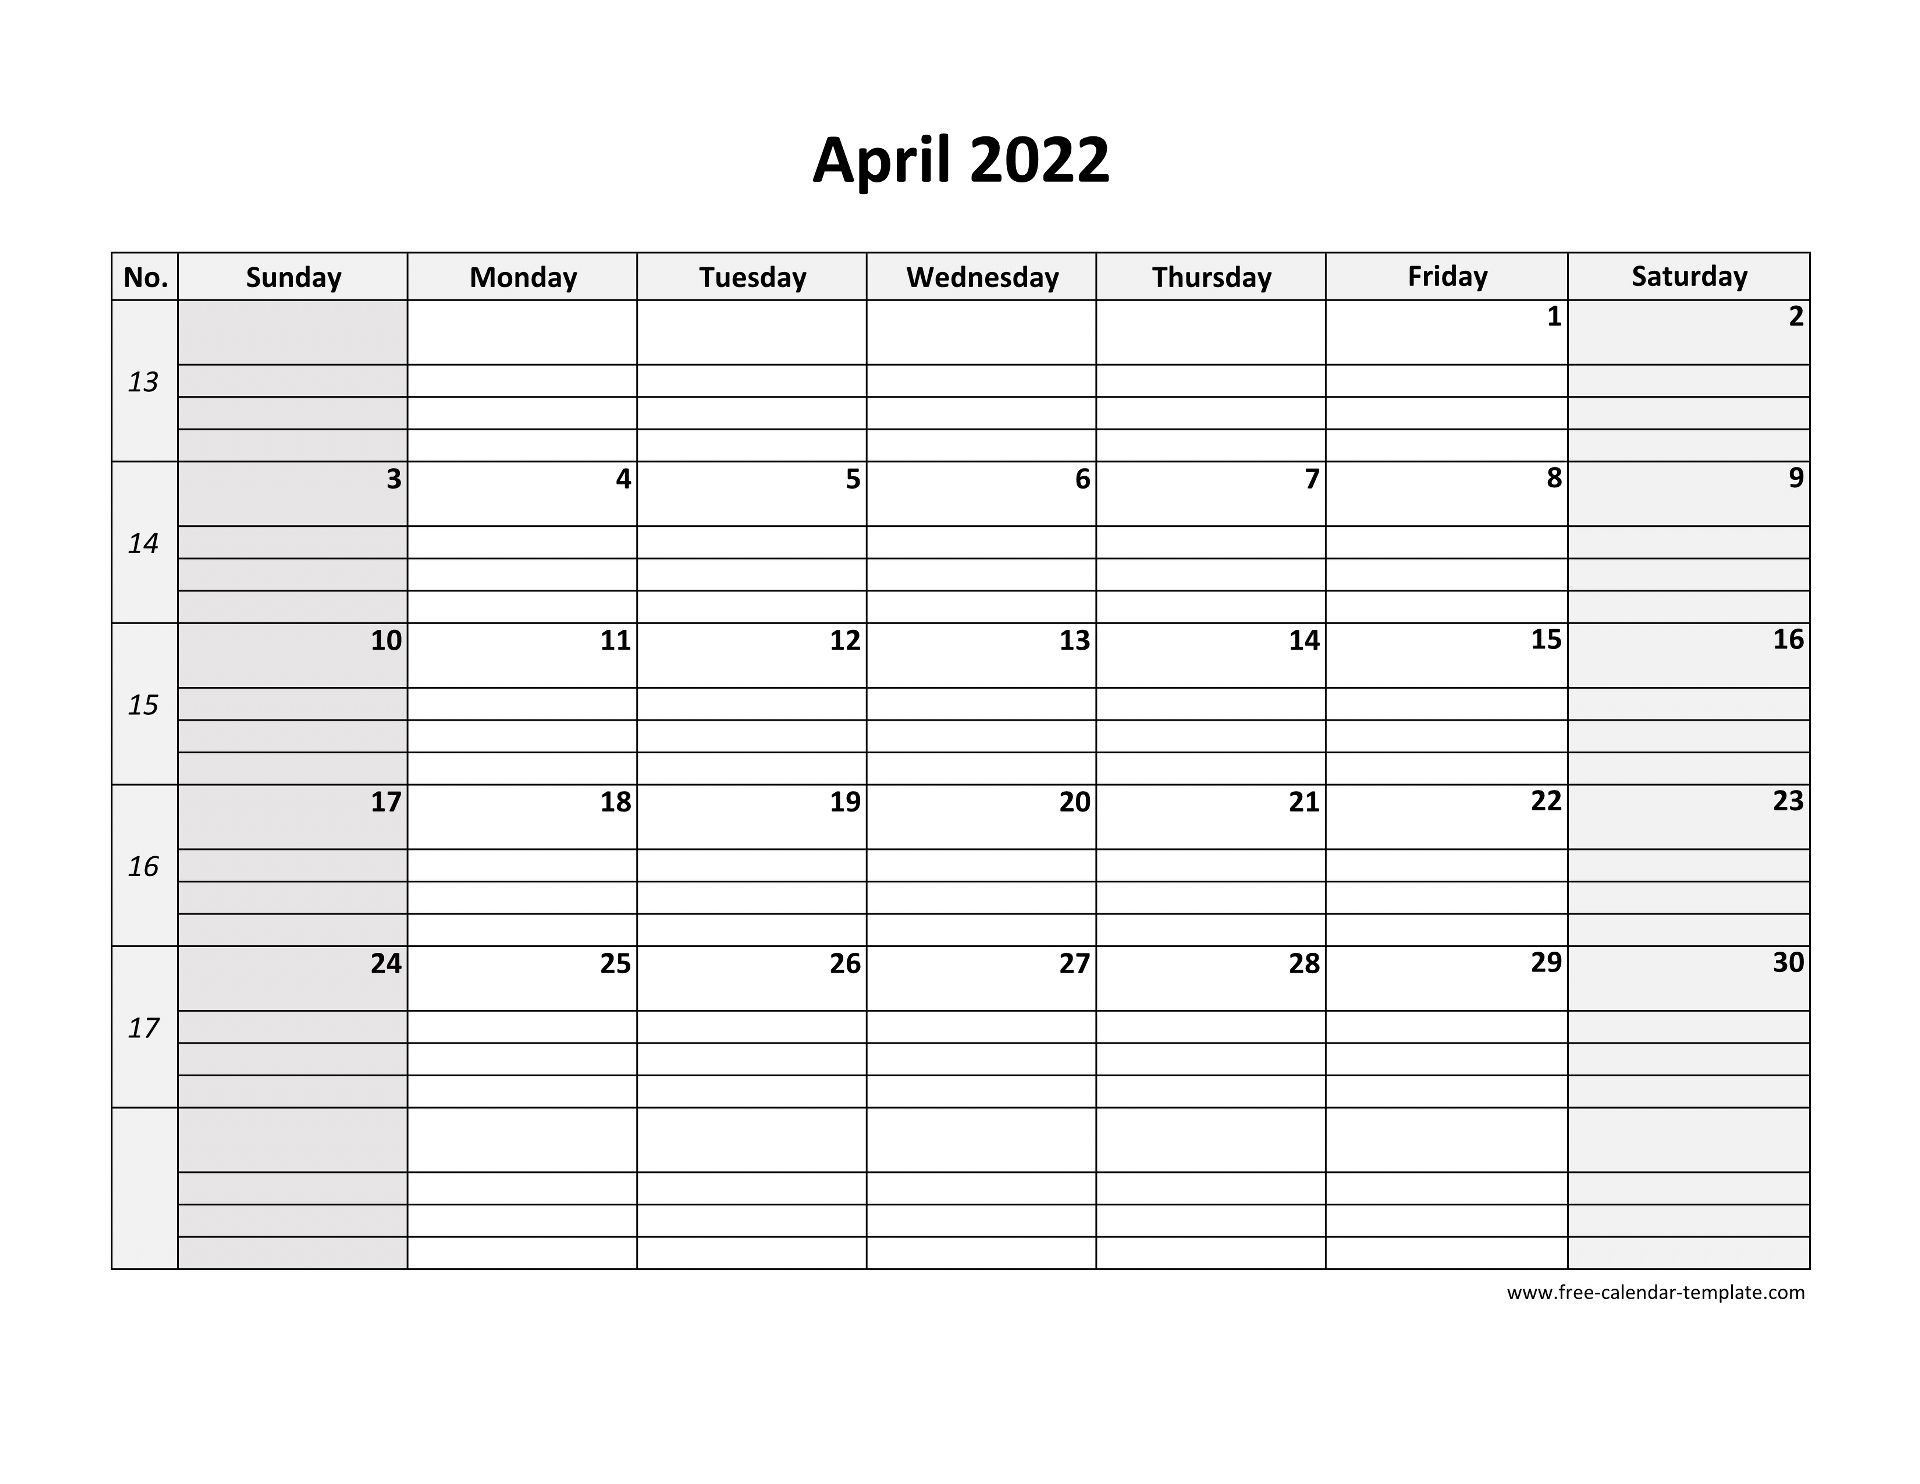 April 2022 Calendar Free Printable with grid lines ...